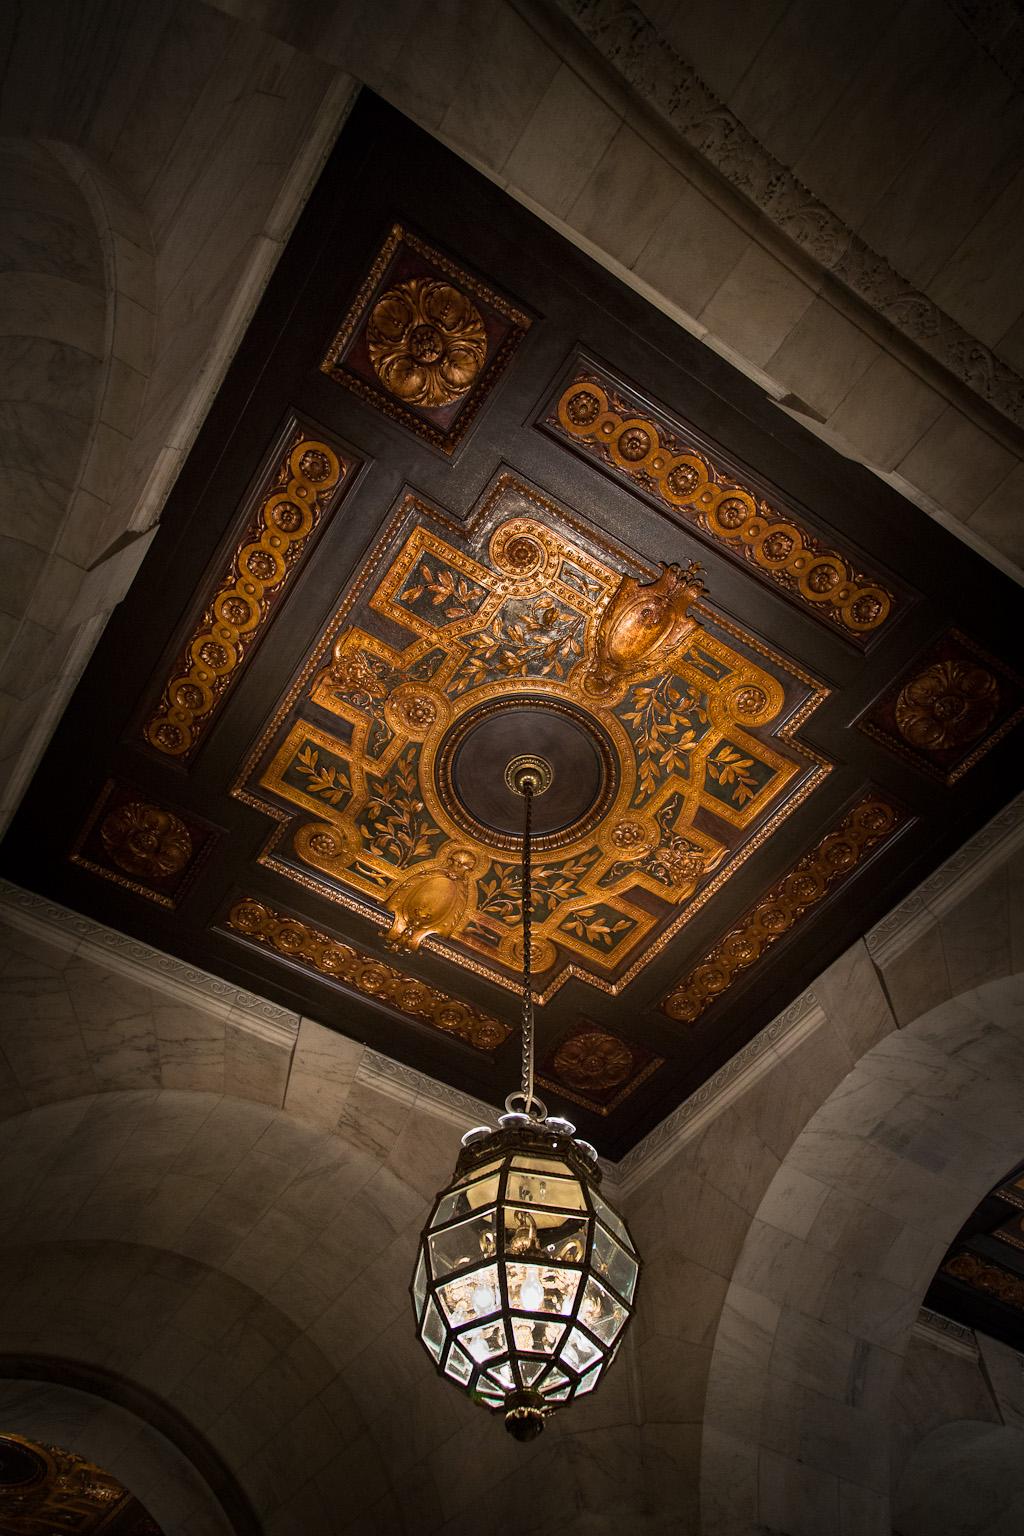 Chandelier – New York Public Library